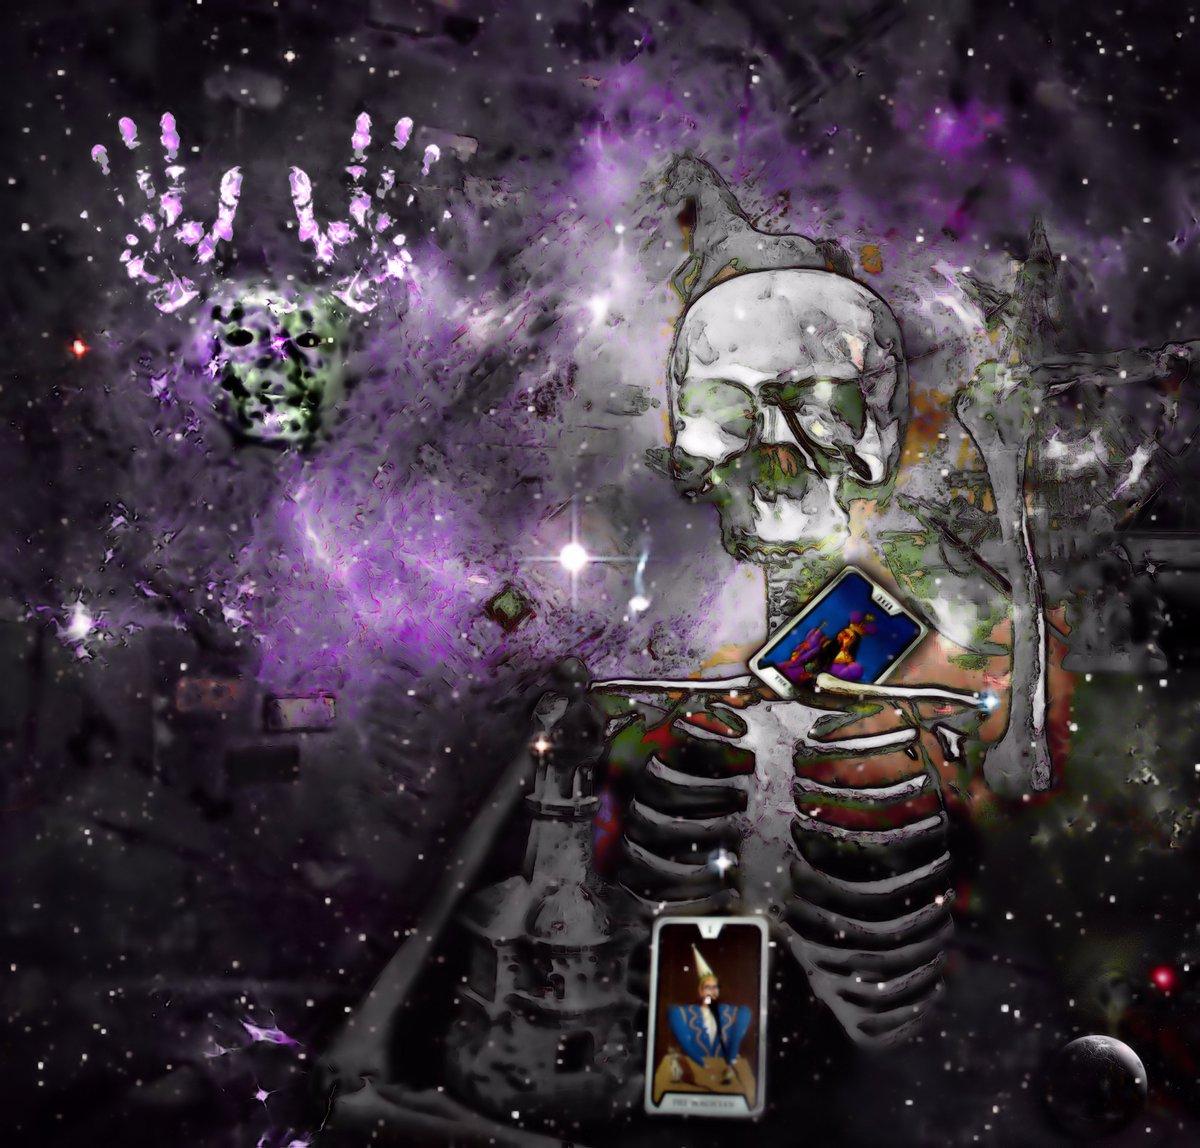 Transcendence (The Skull Dancers)   Grey Cross Studios #art #digitalart #contemporaryArt #skulls #skeletons #death #afterlife #surrealism #alternateuniverse #otherworlds #multiverse #parallelworld #scifi #fantasy #fantasyart